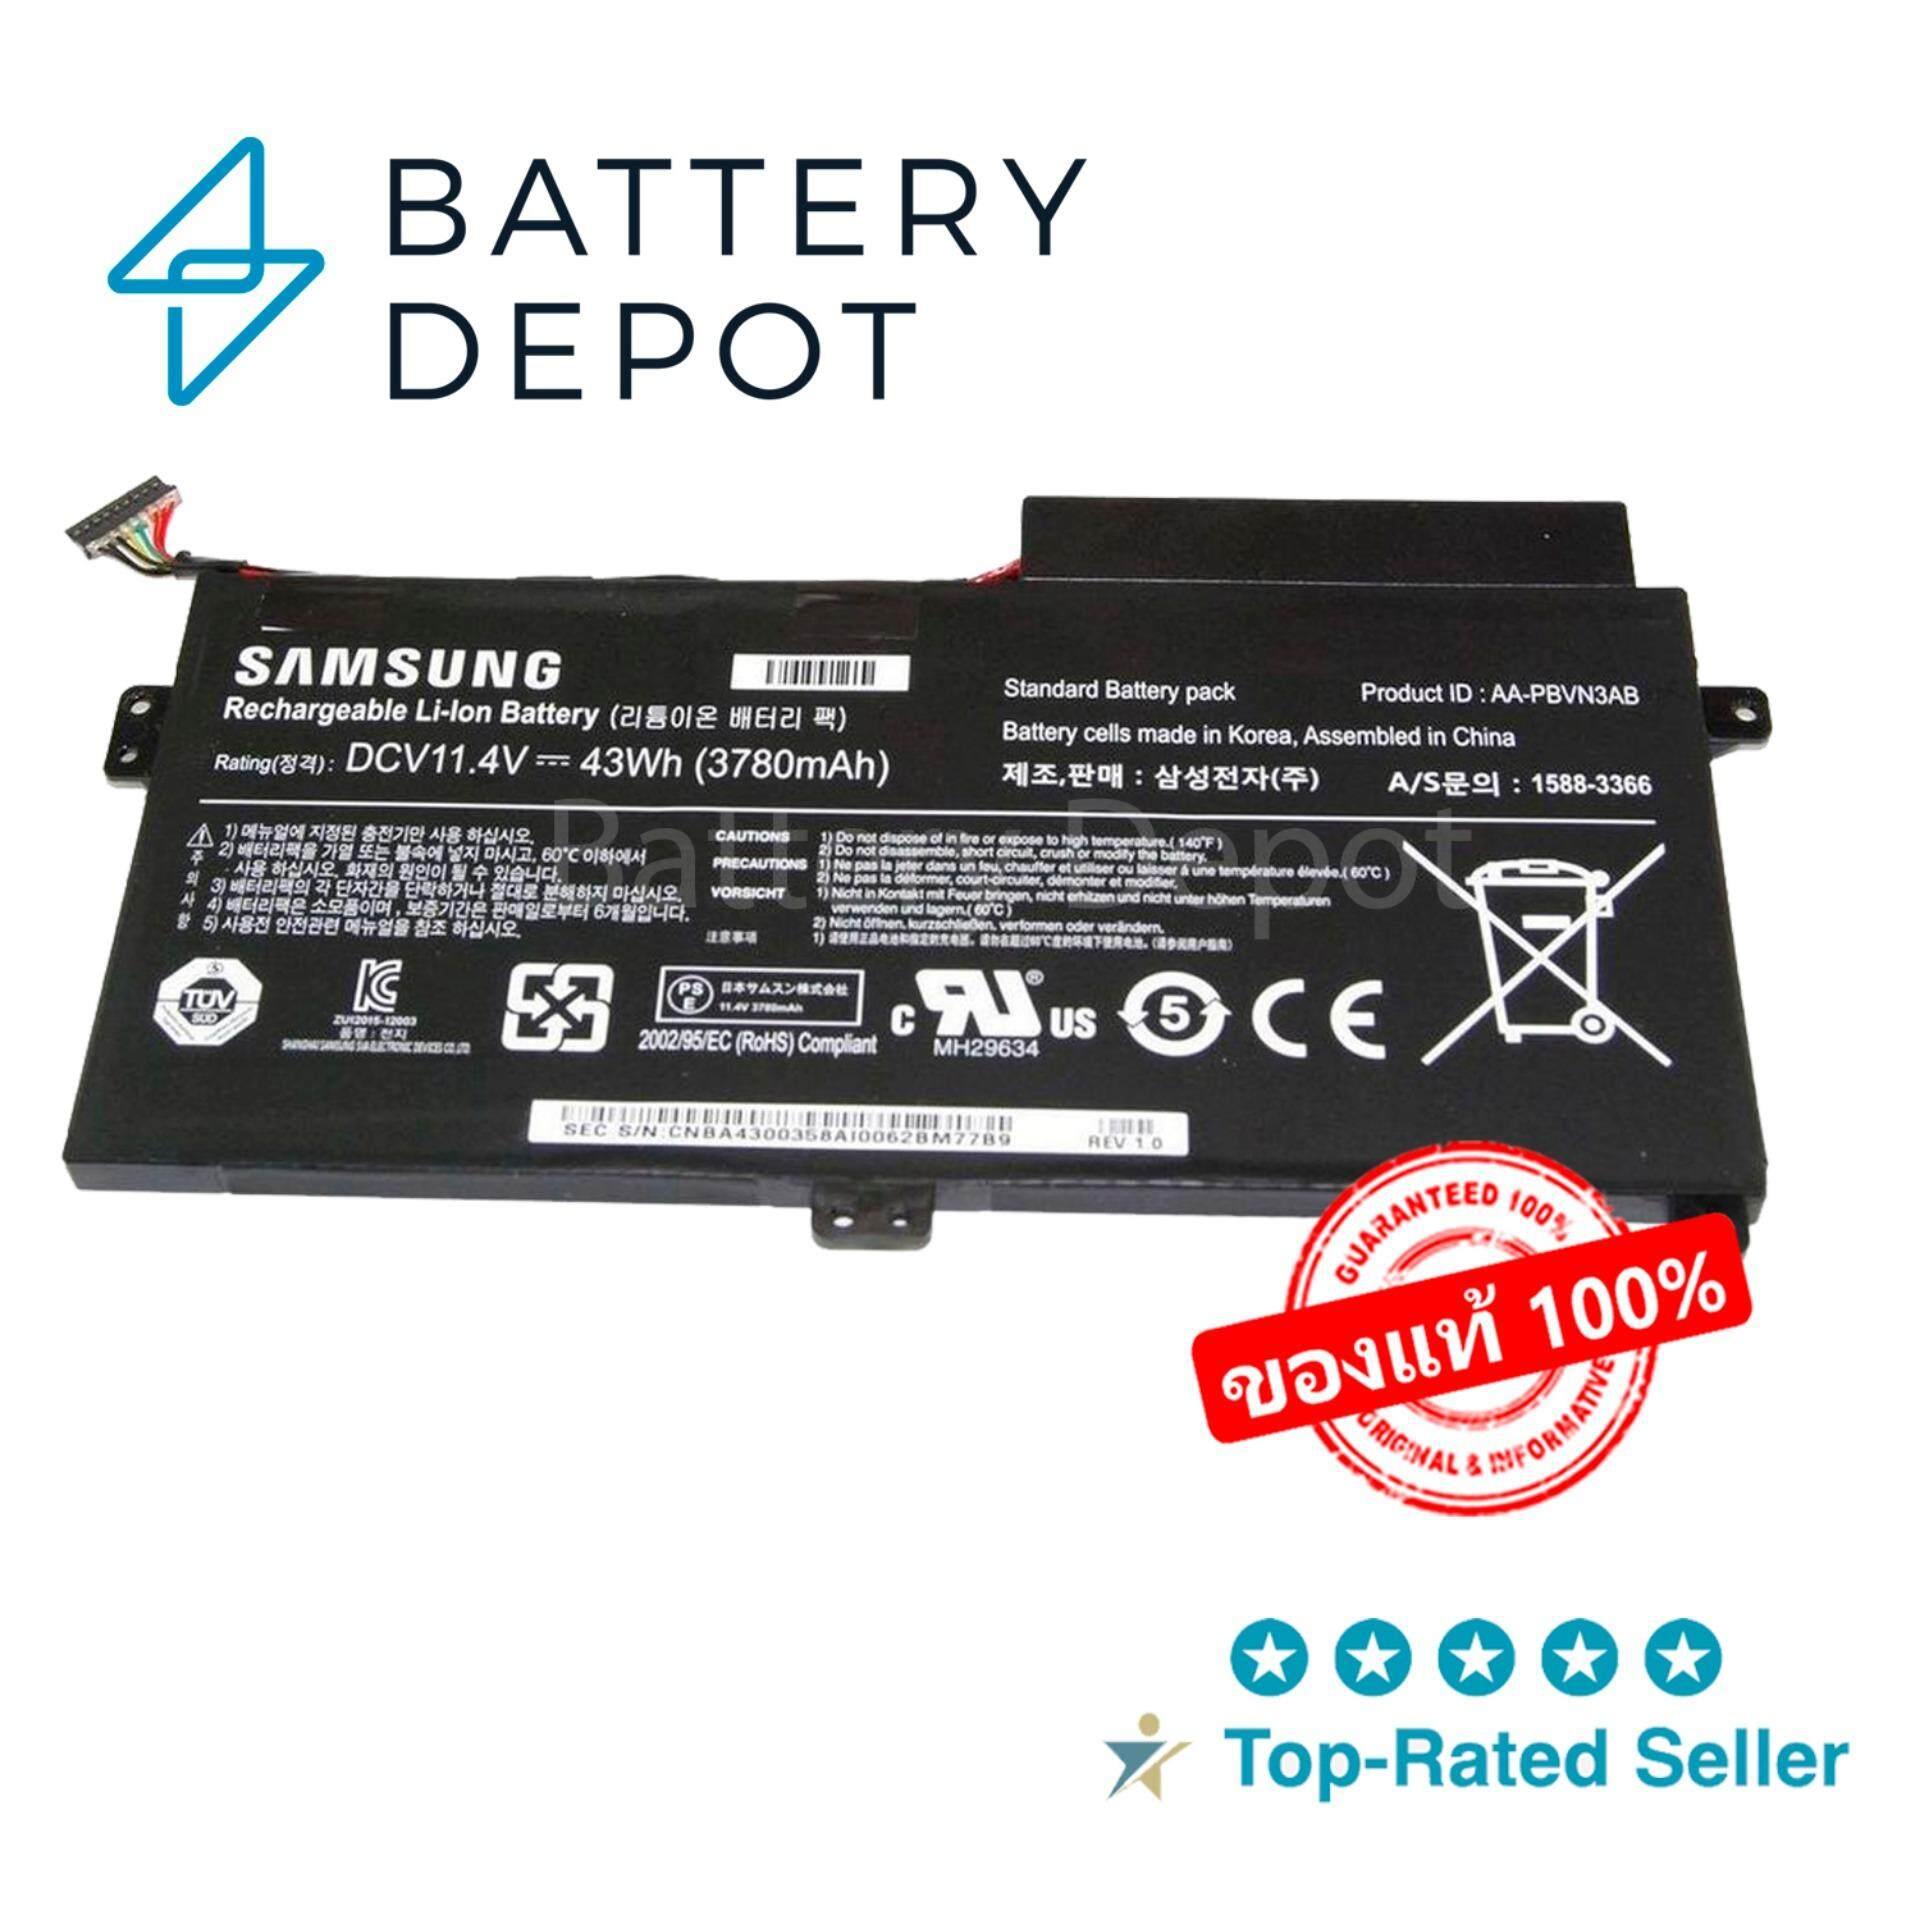 Samsung แบตเตอรี่ ของแท้ รุ่น NP370 Notebook Battery แบตเตอรี่โน๊ตบุ๊ค (สำหรับ Samsung 5 Series, 510R, NP470, NP470R5E, NP510R5E, NP370R4E, NP370R5E, NP450R4E, NP450R4V, NP450R5V Series : AA-PBVN3AB